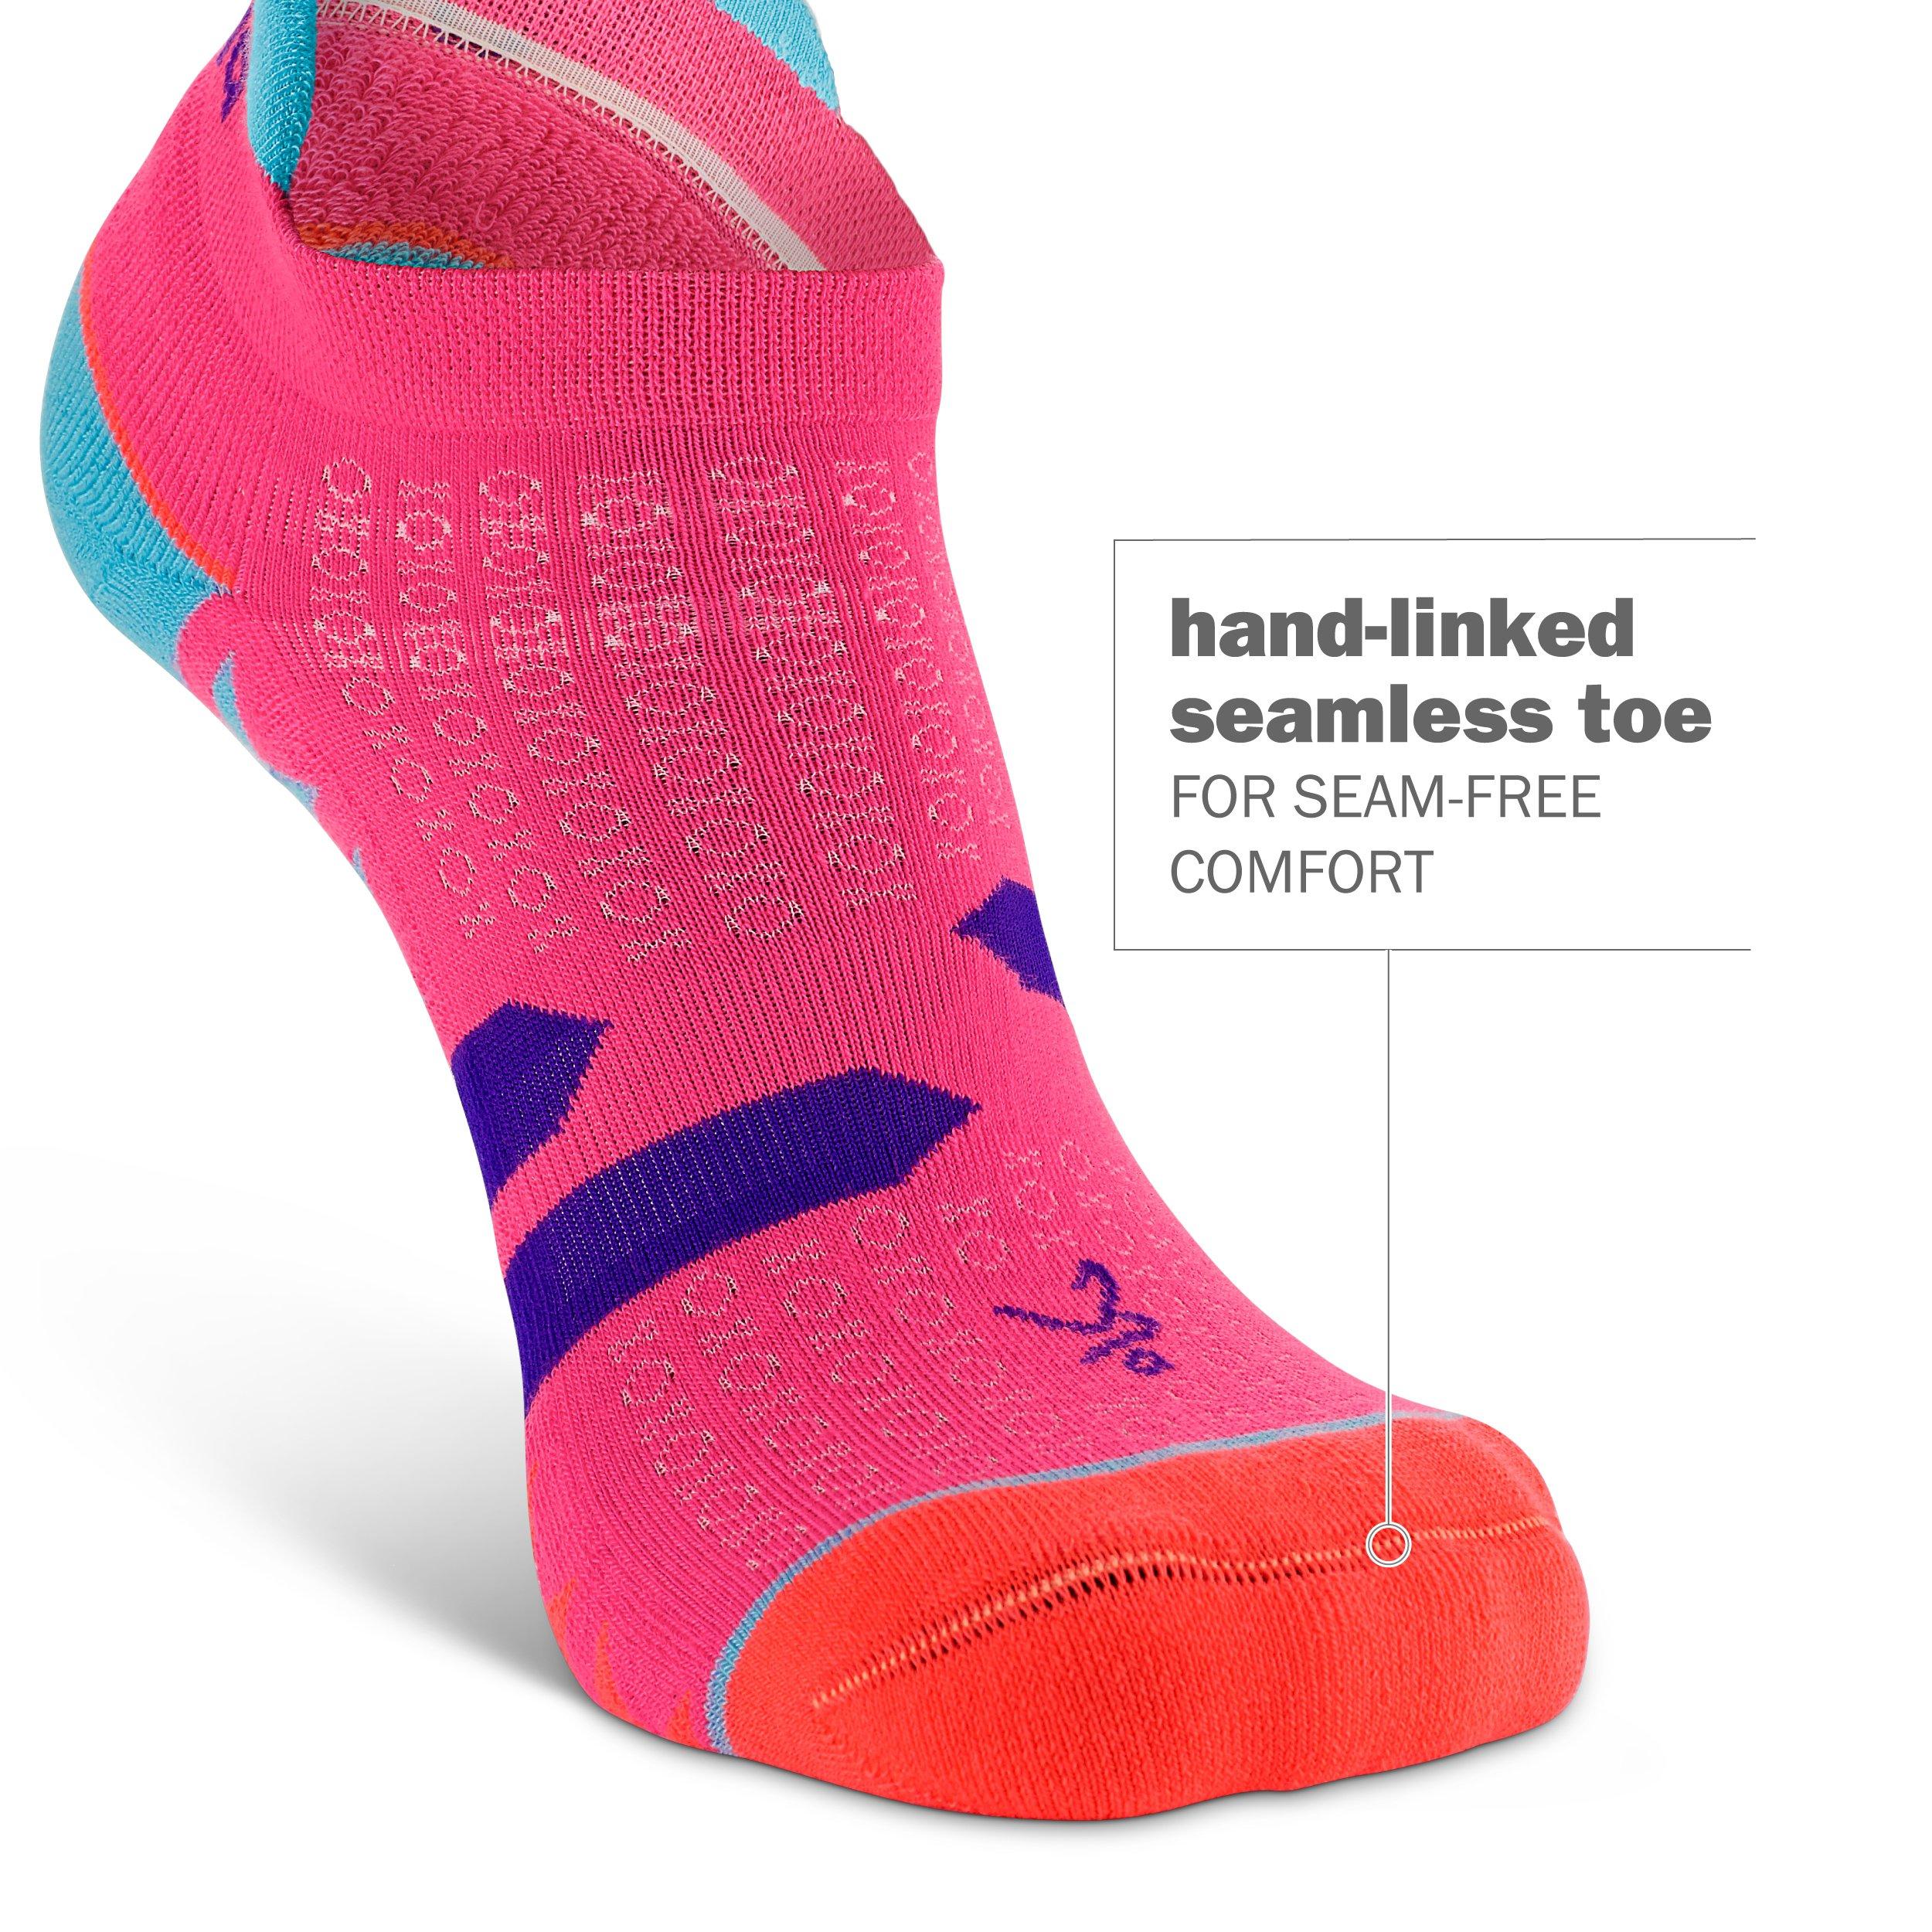 Balega Women's Enduro No Show Socks (1 Pair), Watermelon/Orange, Medium by Balega (Image #2)